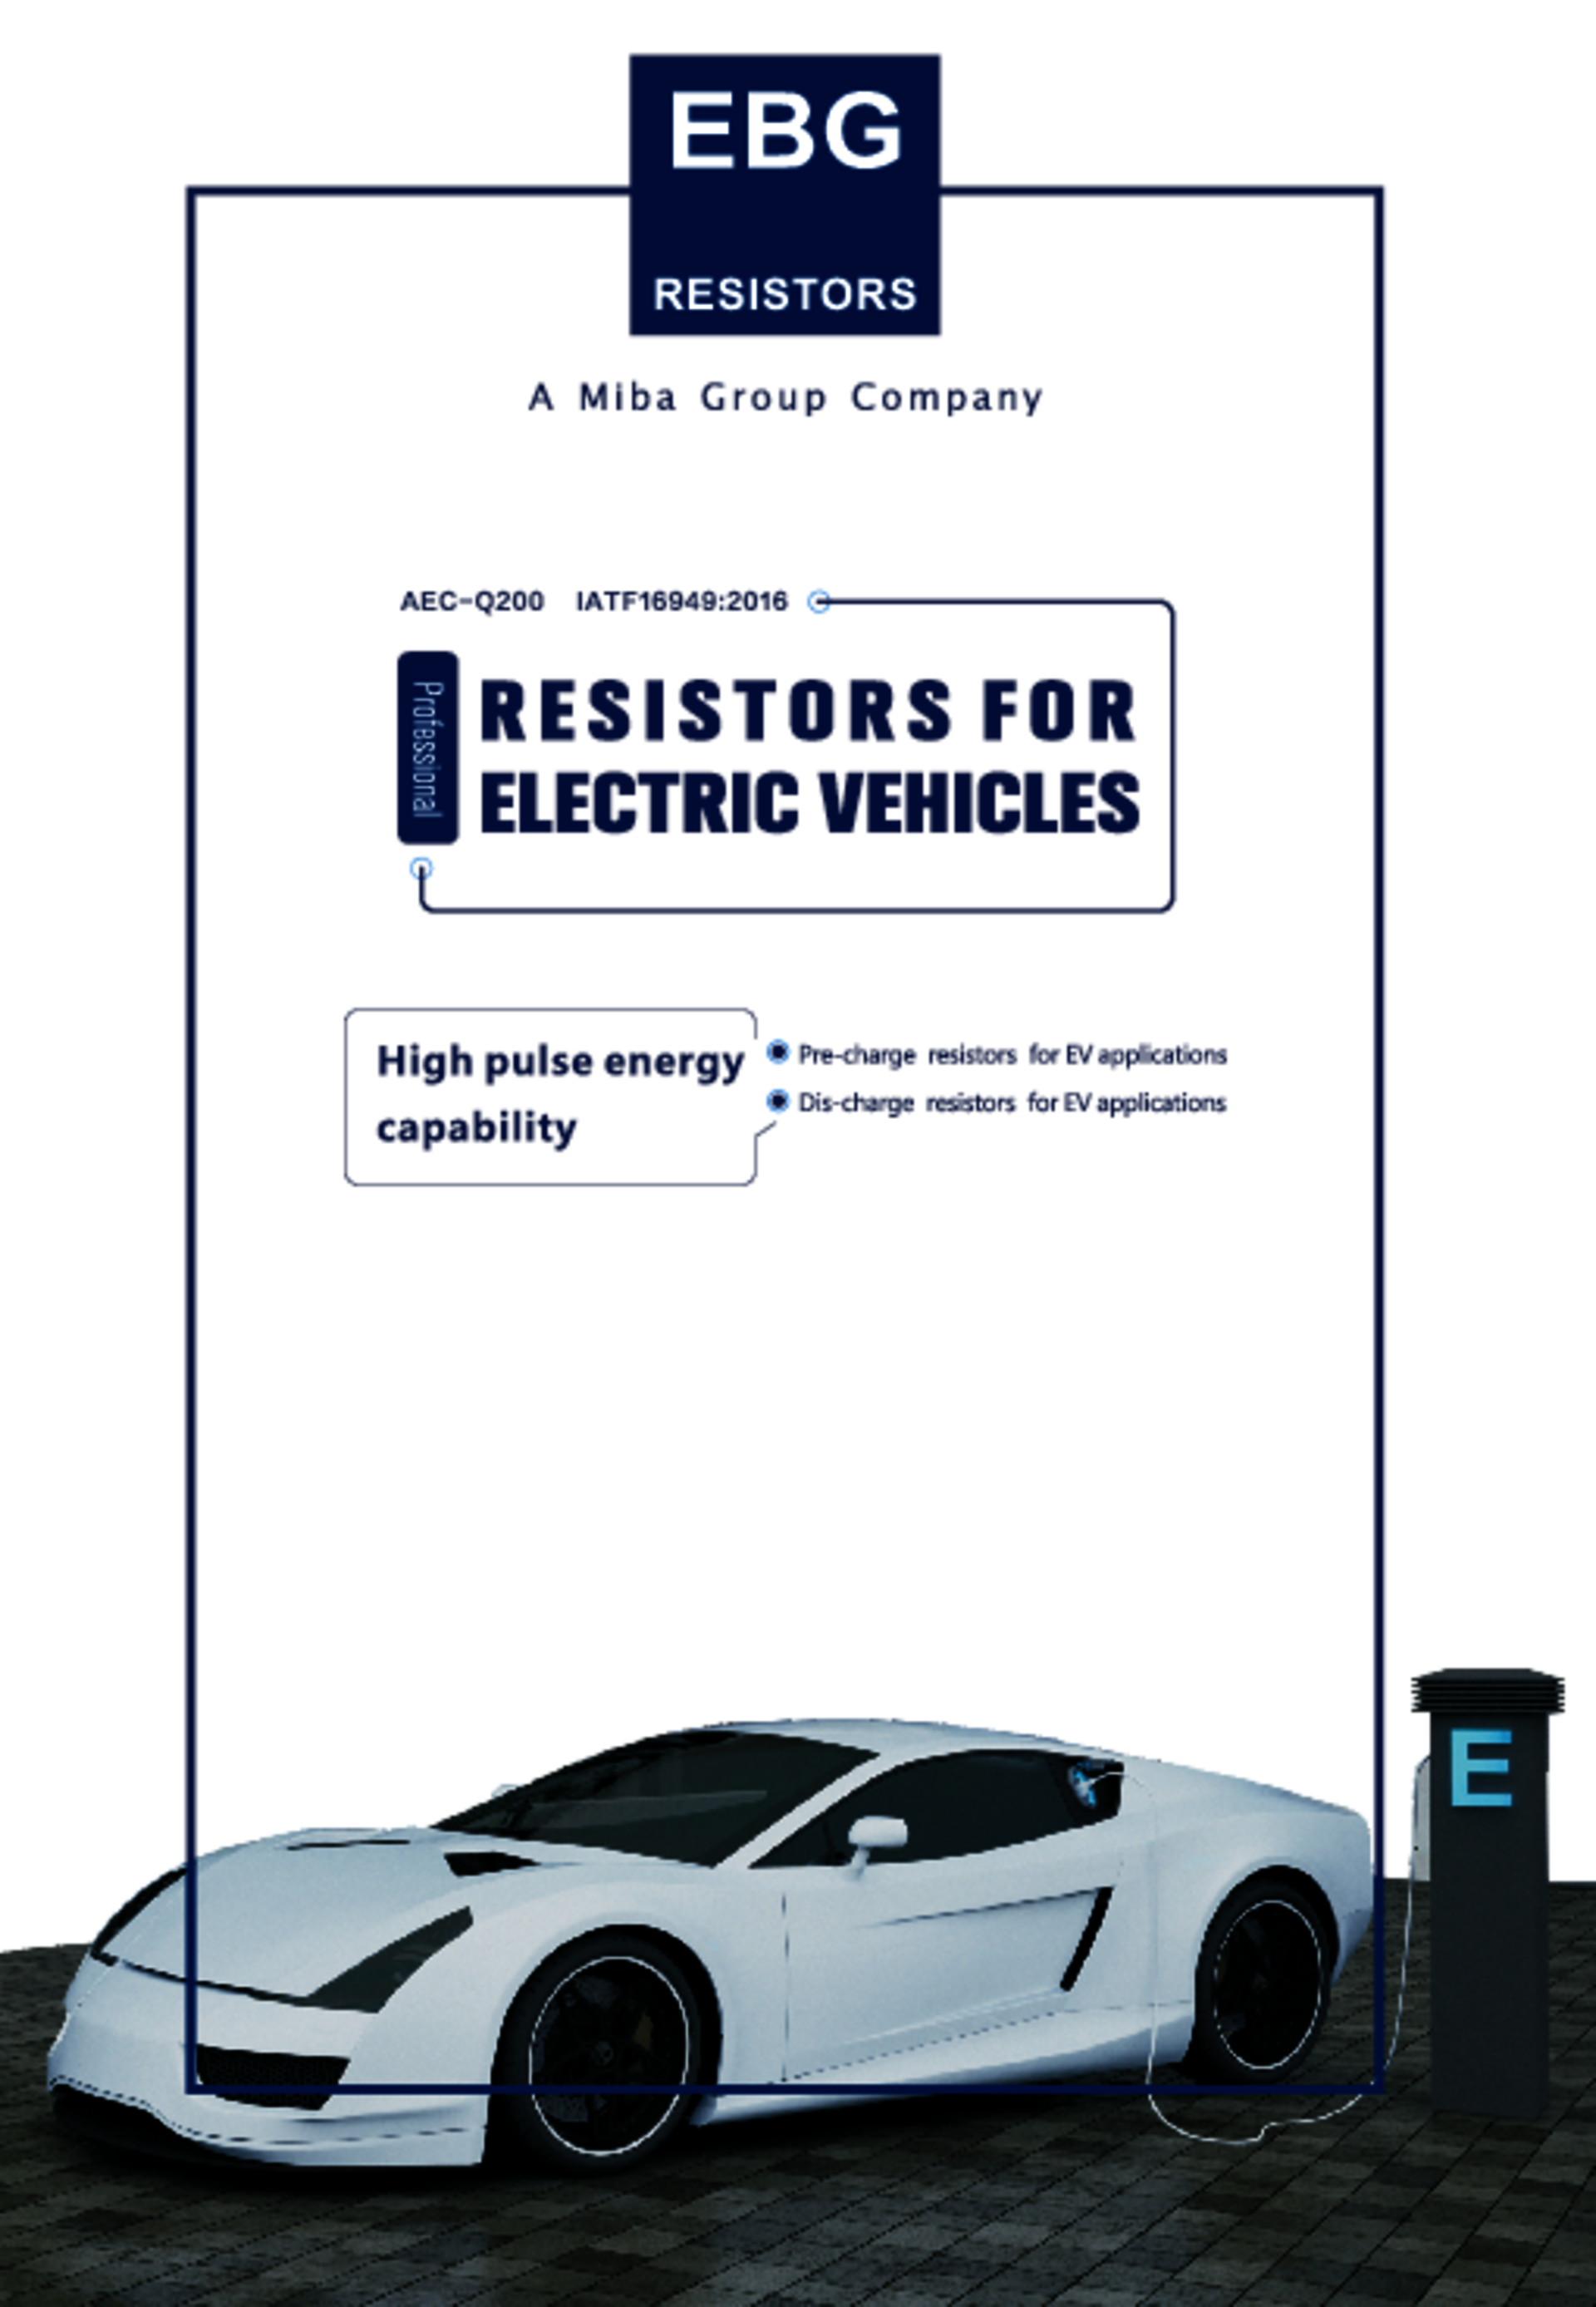 EBG Resistors EV catalog